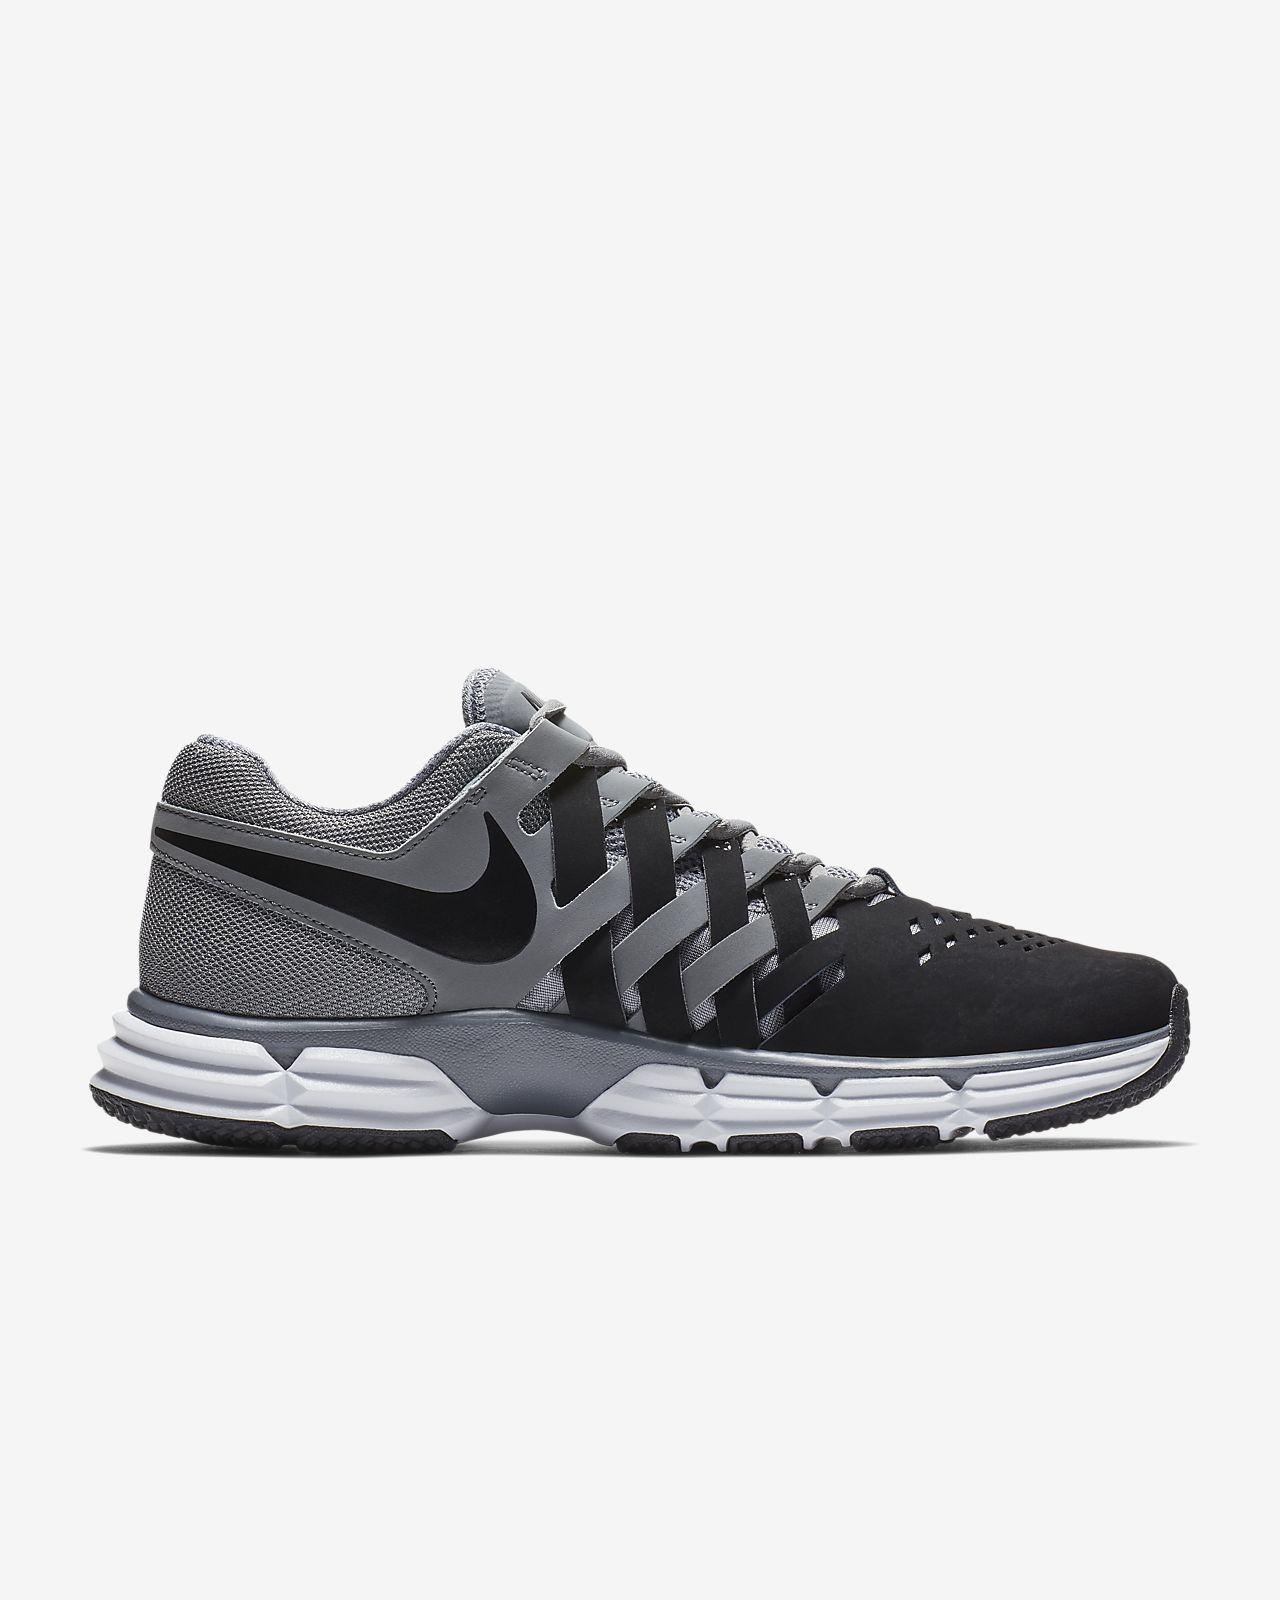 the latest 30491 7f006 ... Nike Lunar Fingertrap TR Men s Gym Gameday Shoe